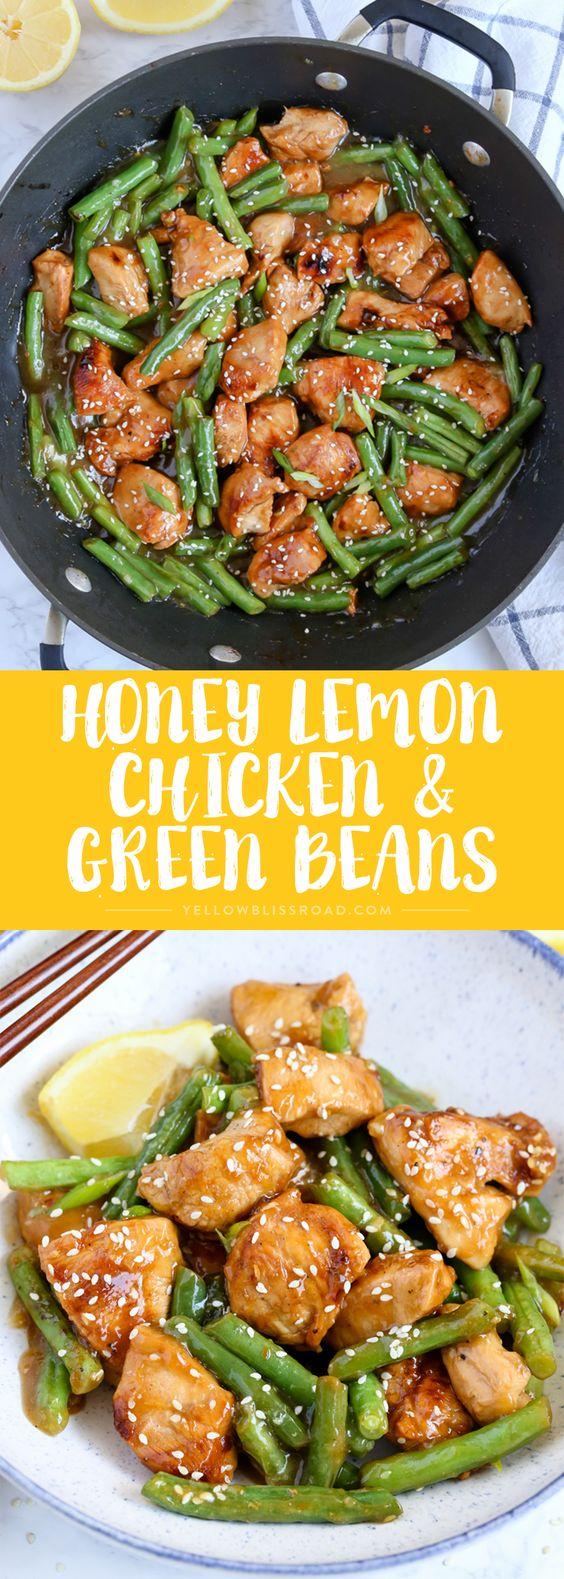 HONEY LEMON CHICKEN AND GREEN BEANS STIR FRY